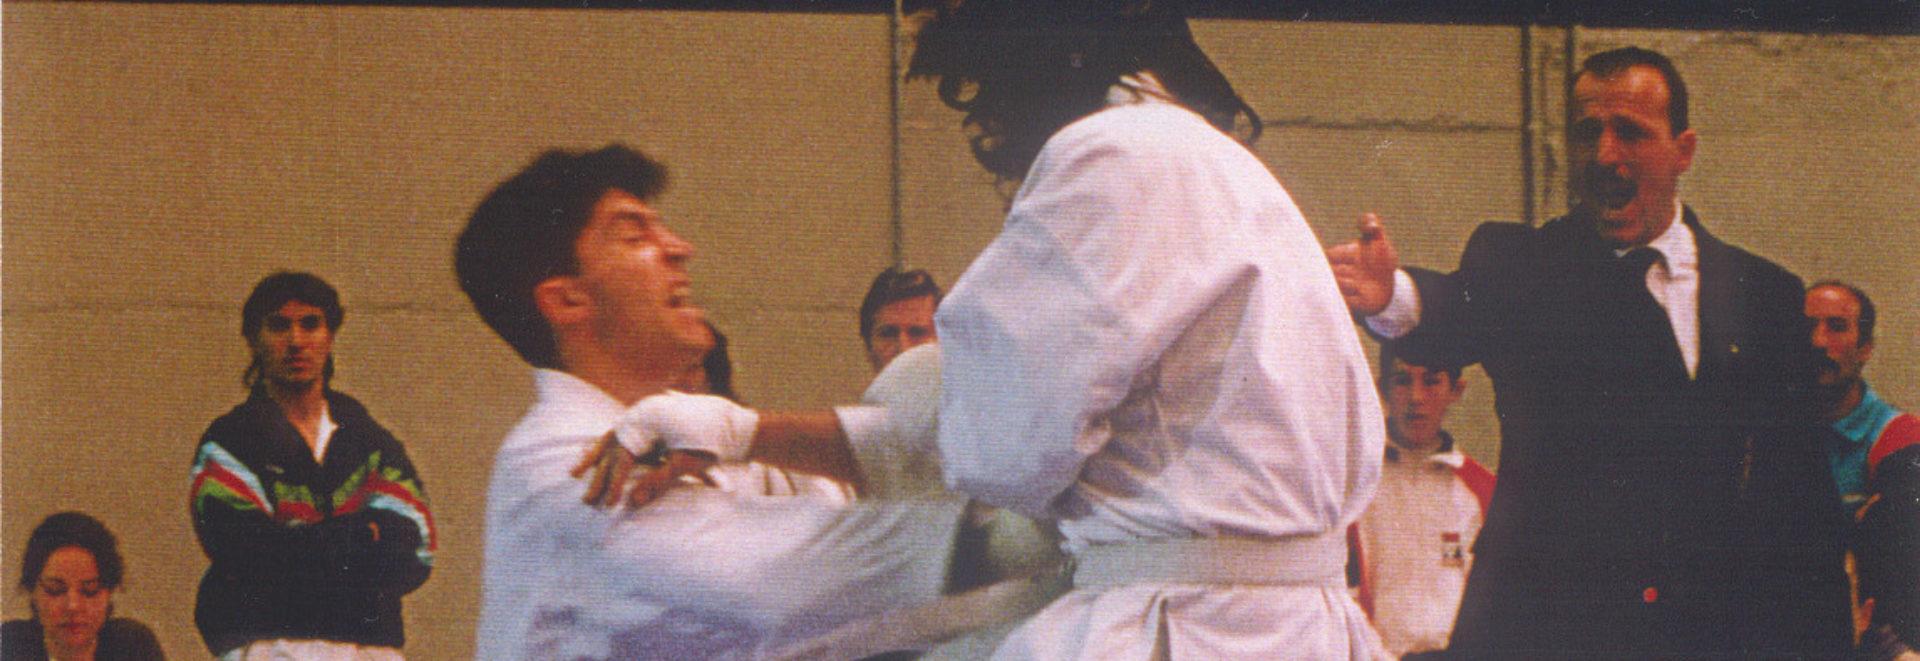 Karate mrprepor